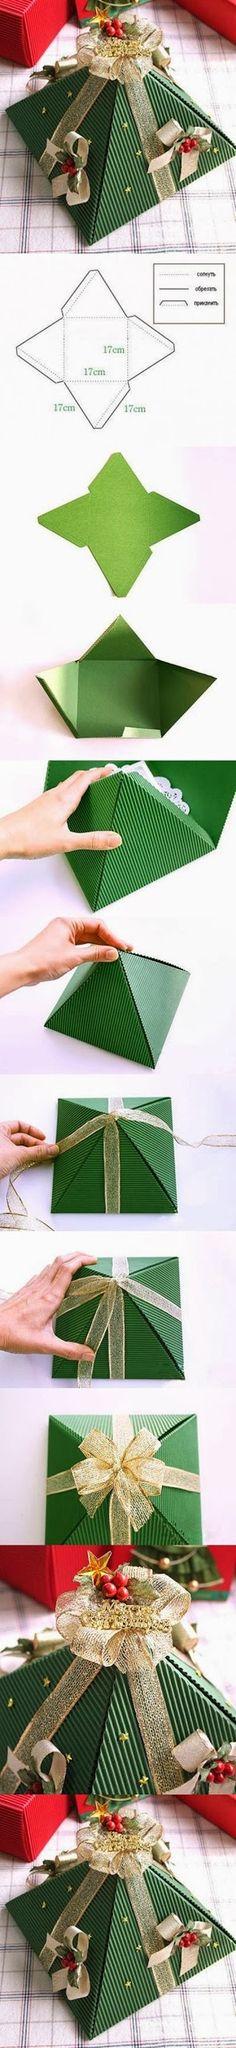 DIY-Pyramid-Christmas-Box